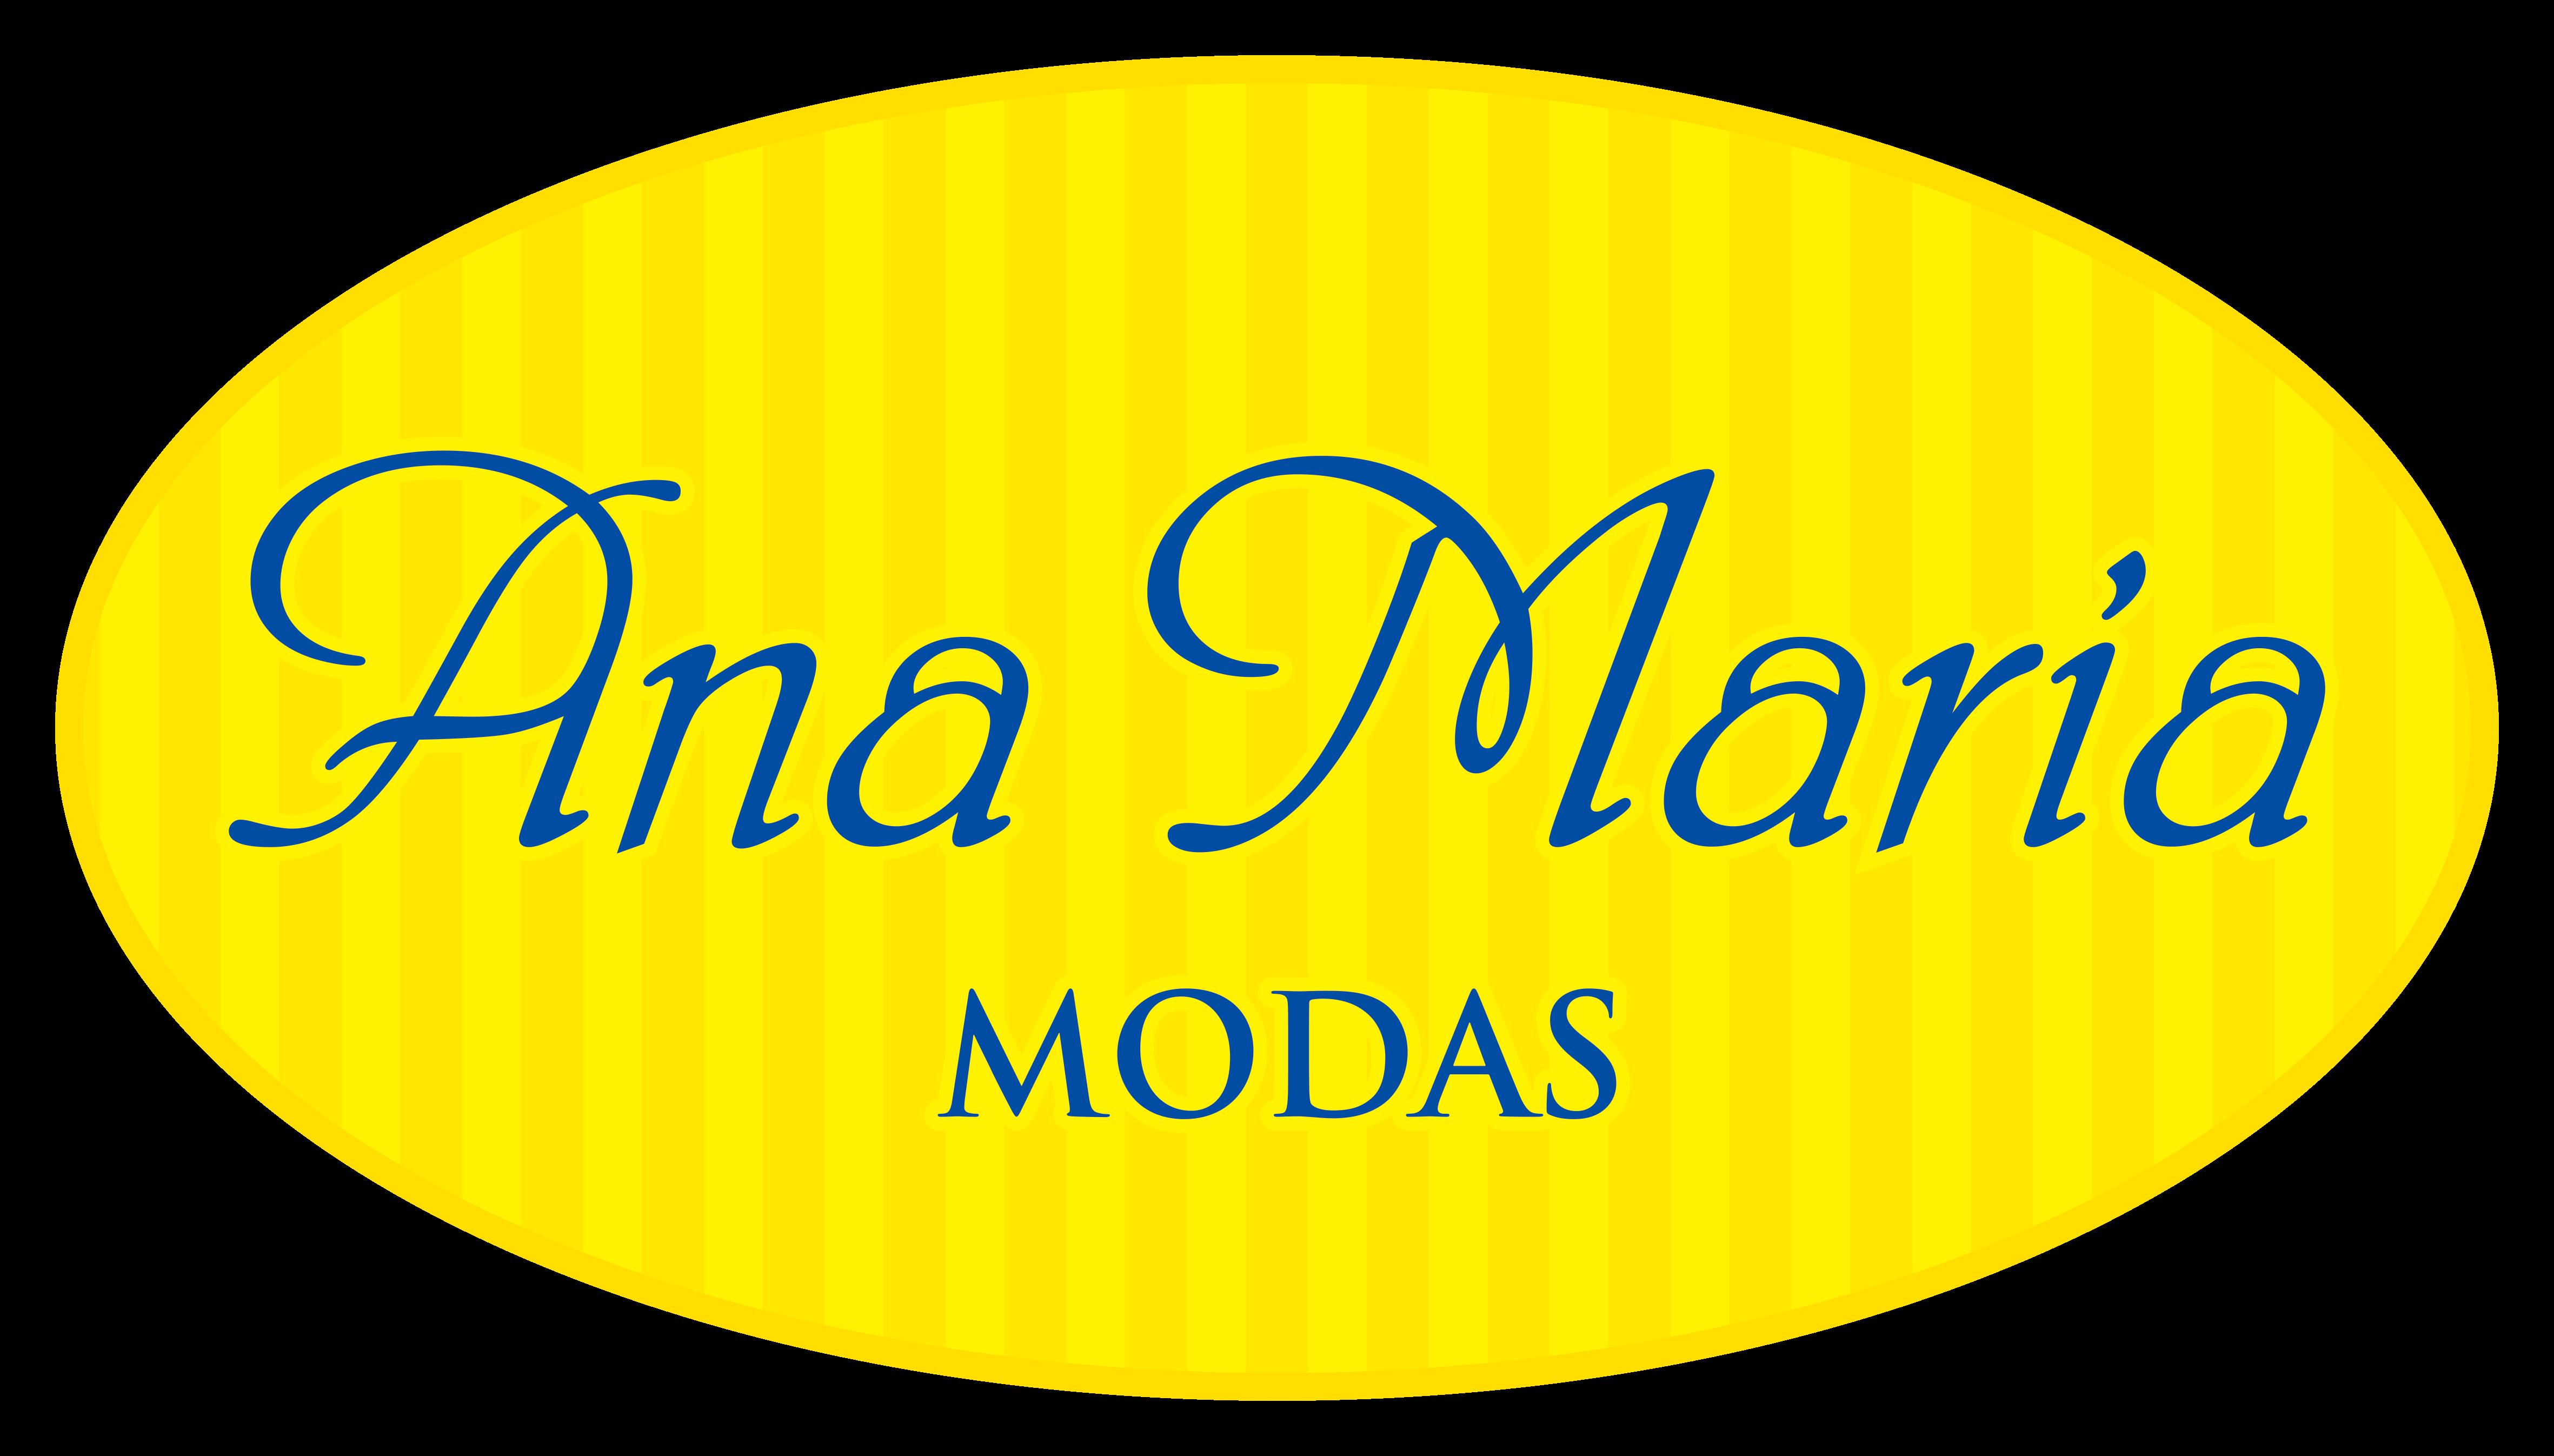 ANAMARIA MODAS